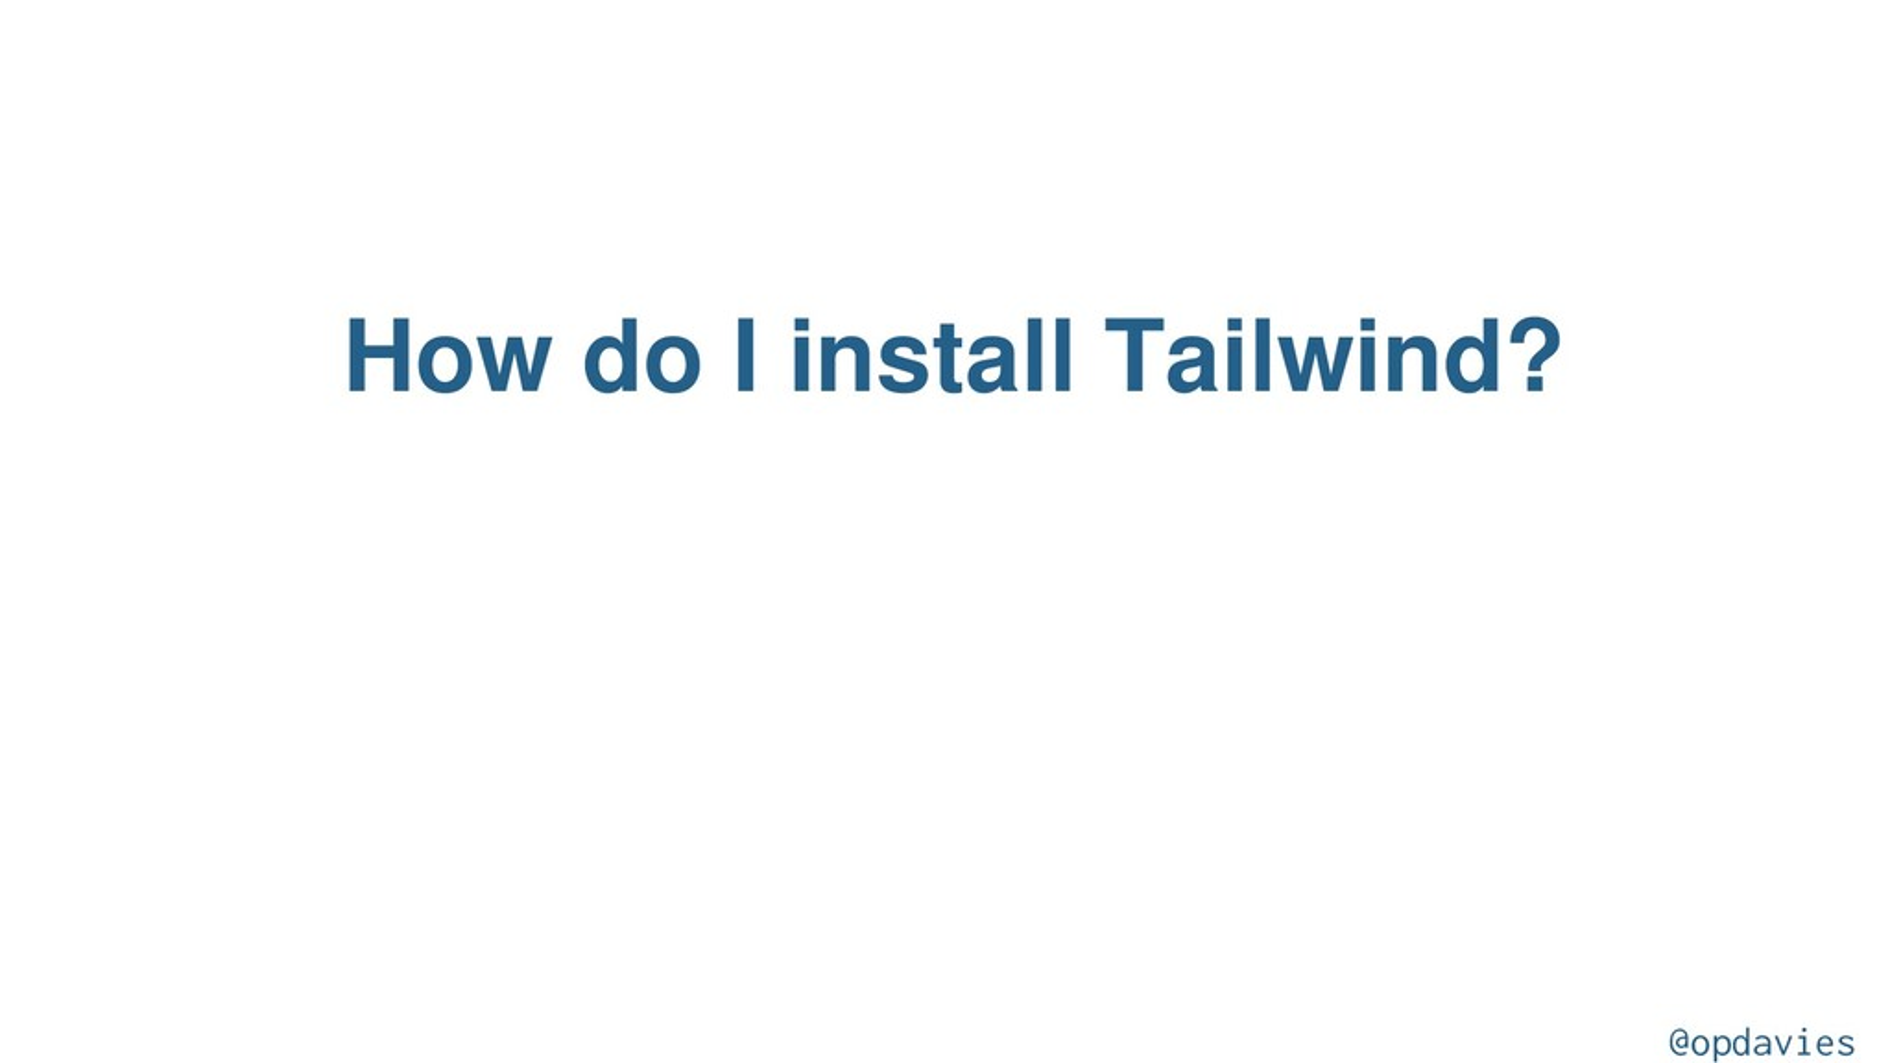 How do I install Tailwind? @opdavies